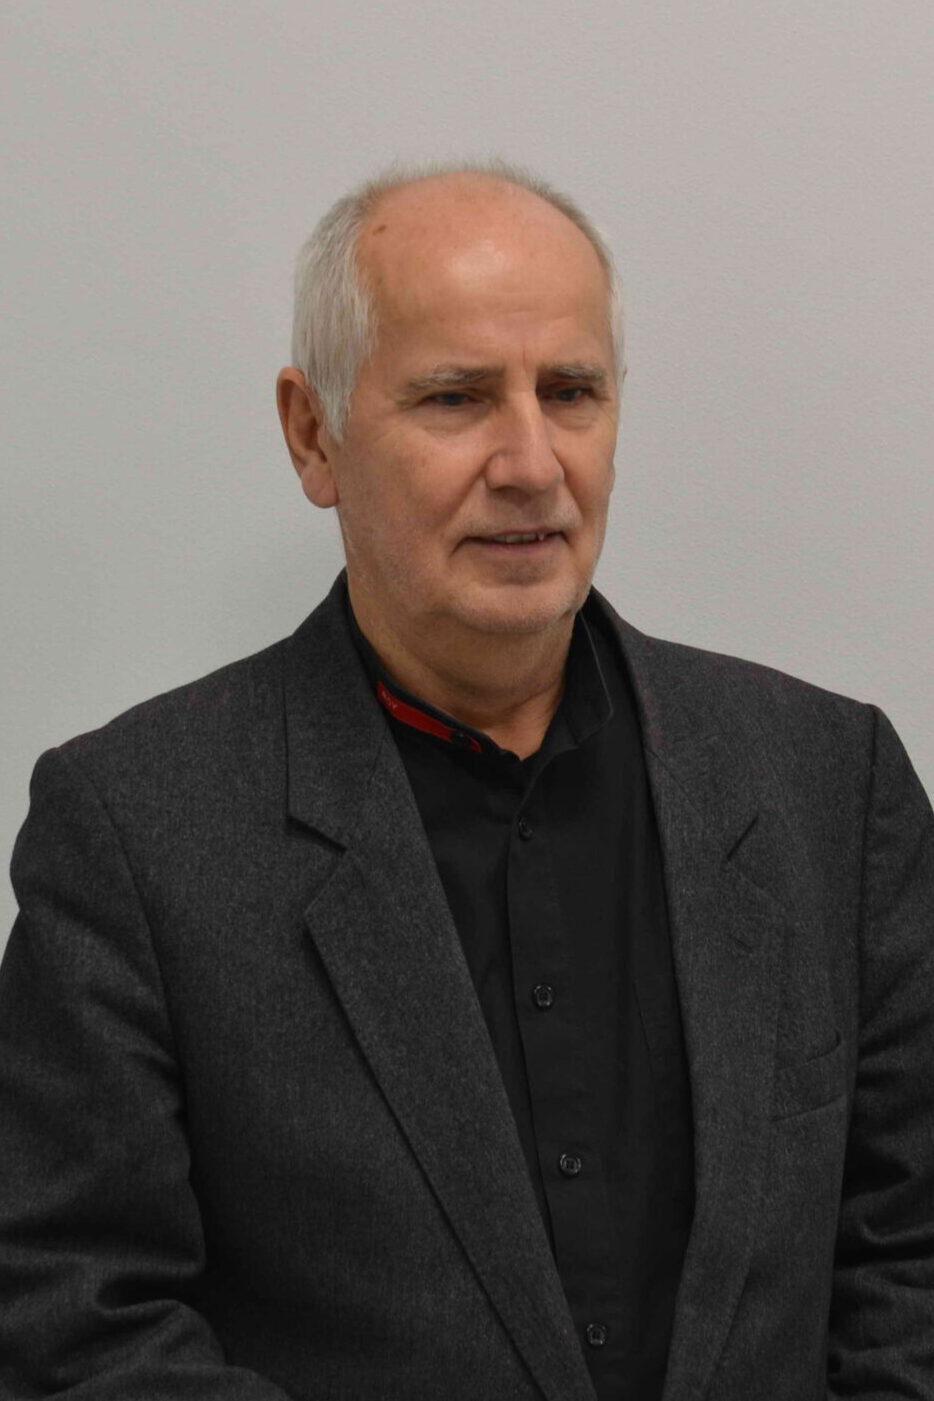 Robert Walkiewicz